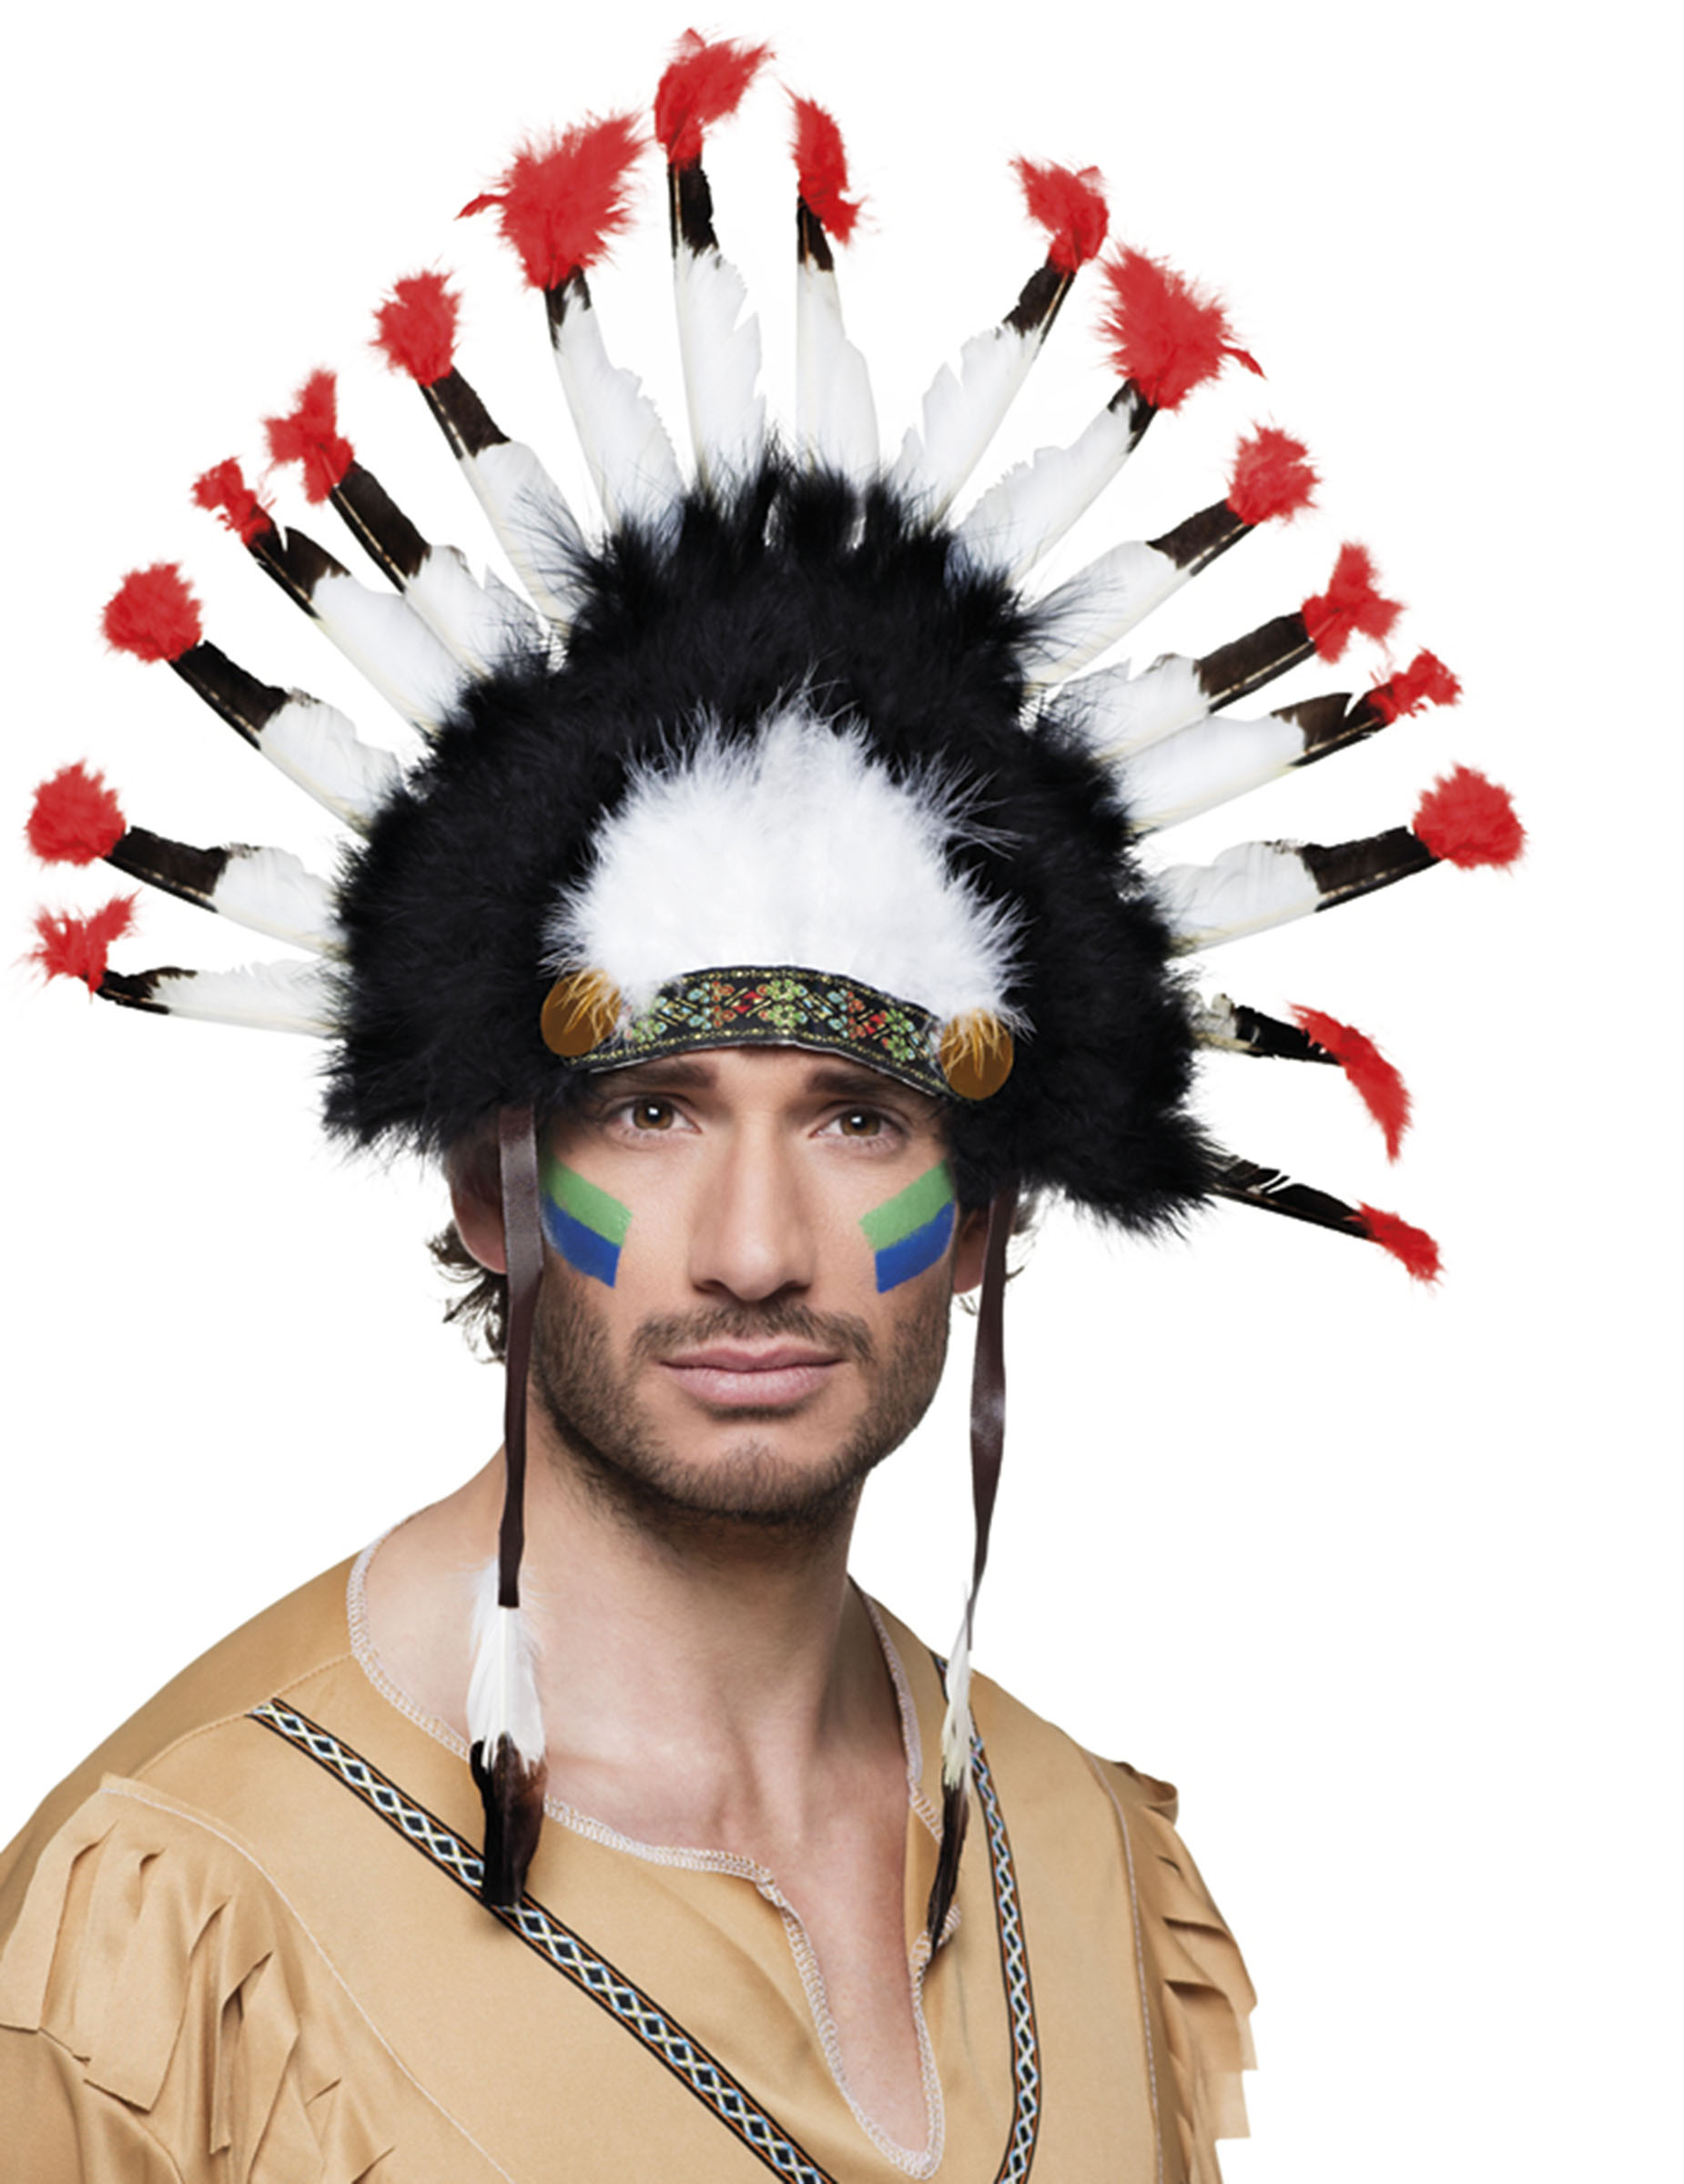 indianer kopfschmuck federn bunt g nstige faschings accessoires zubeh r bei karneval megastore. Black Bedroom Furniture Sets. Home Design Ideas